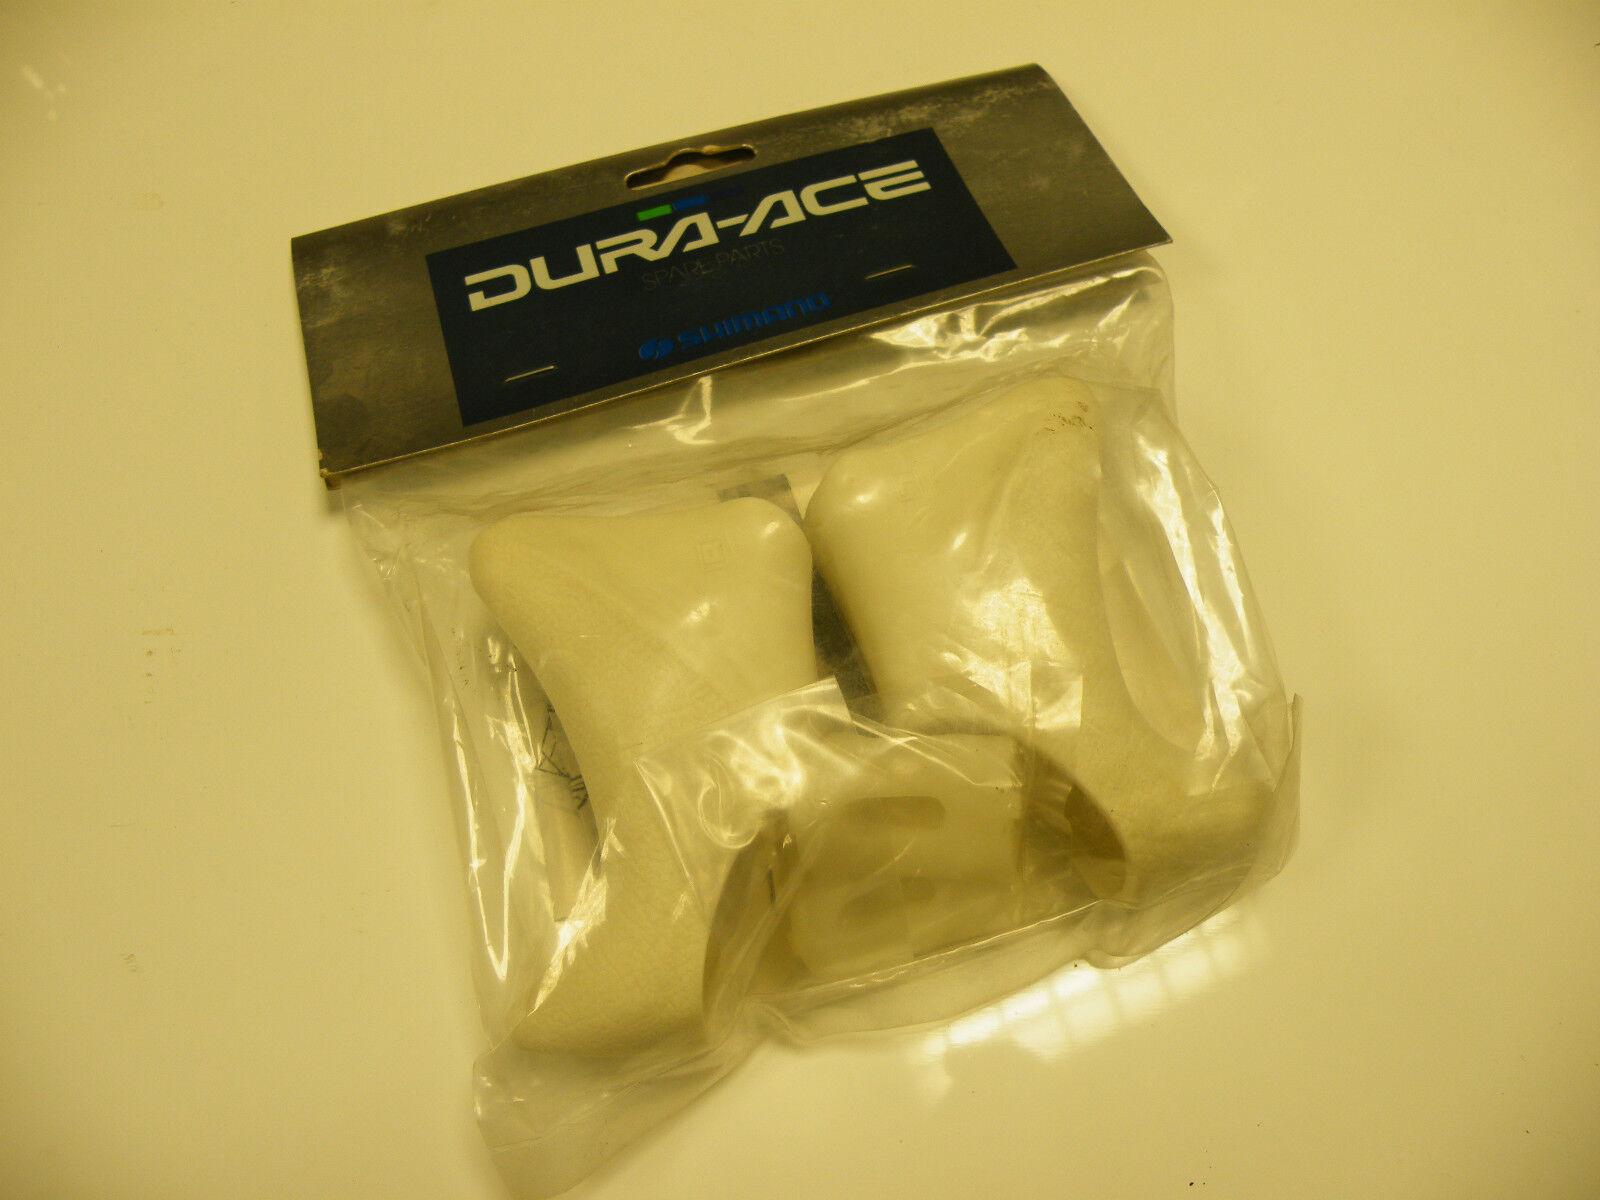 Shimano Dura Ace 9801 white aero leverhoods,new in bag